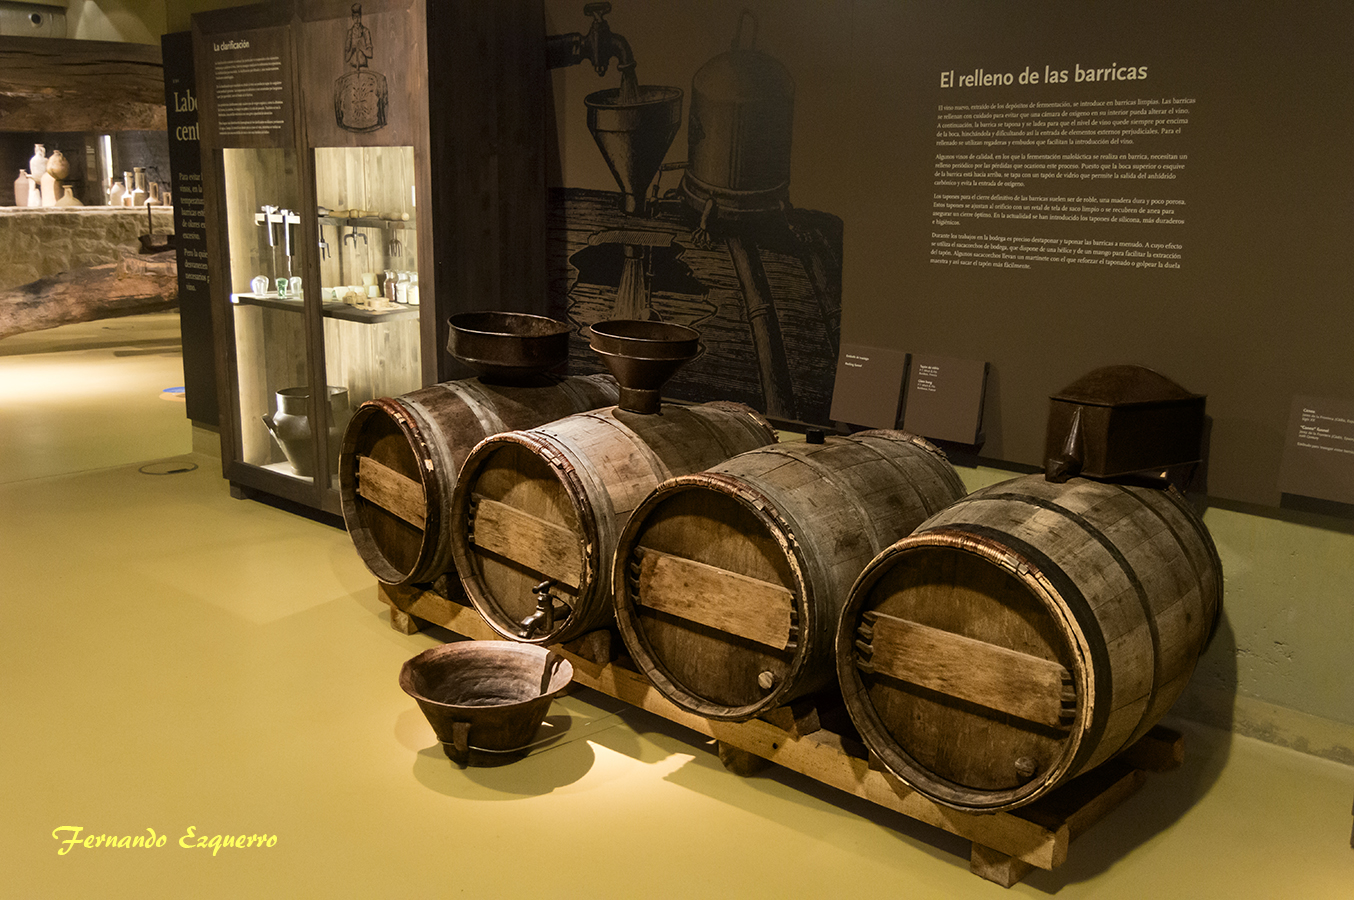 Museo de la Cultura del Vino